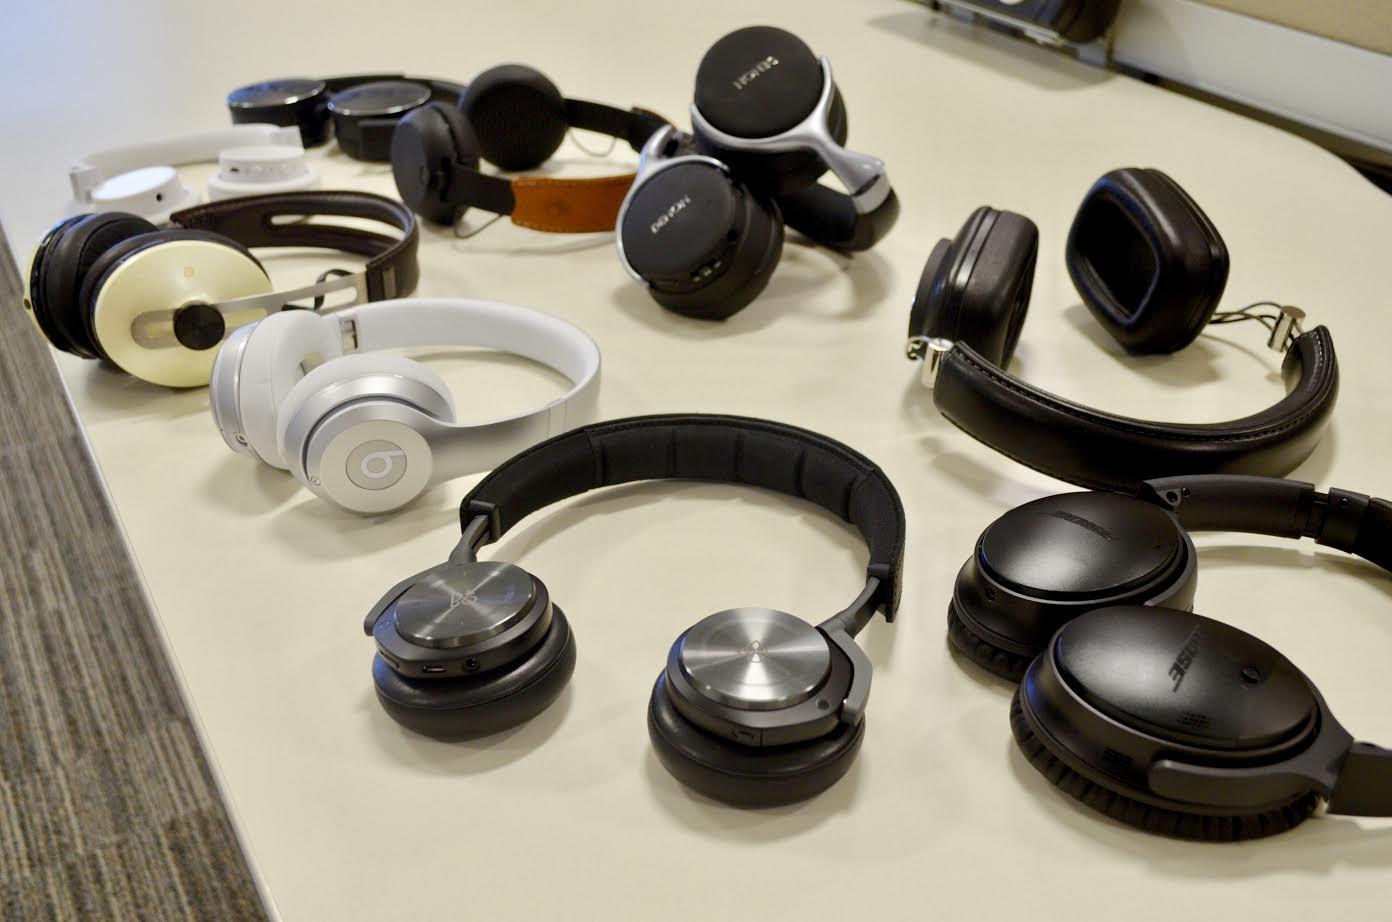 Wireless headphones review round up